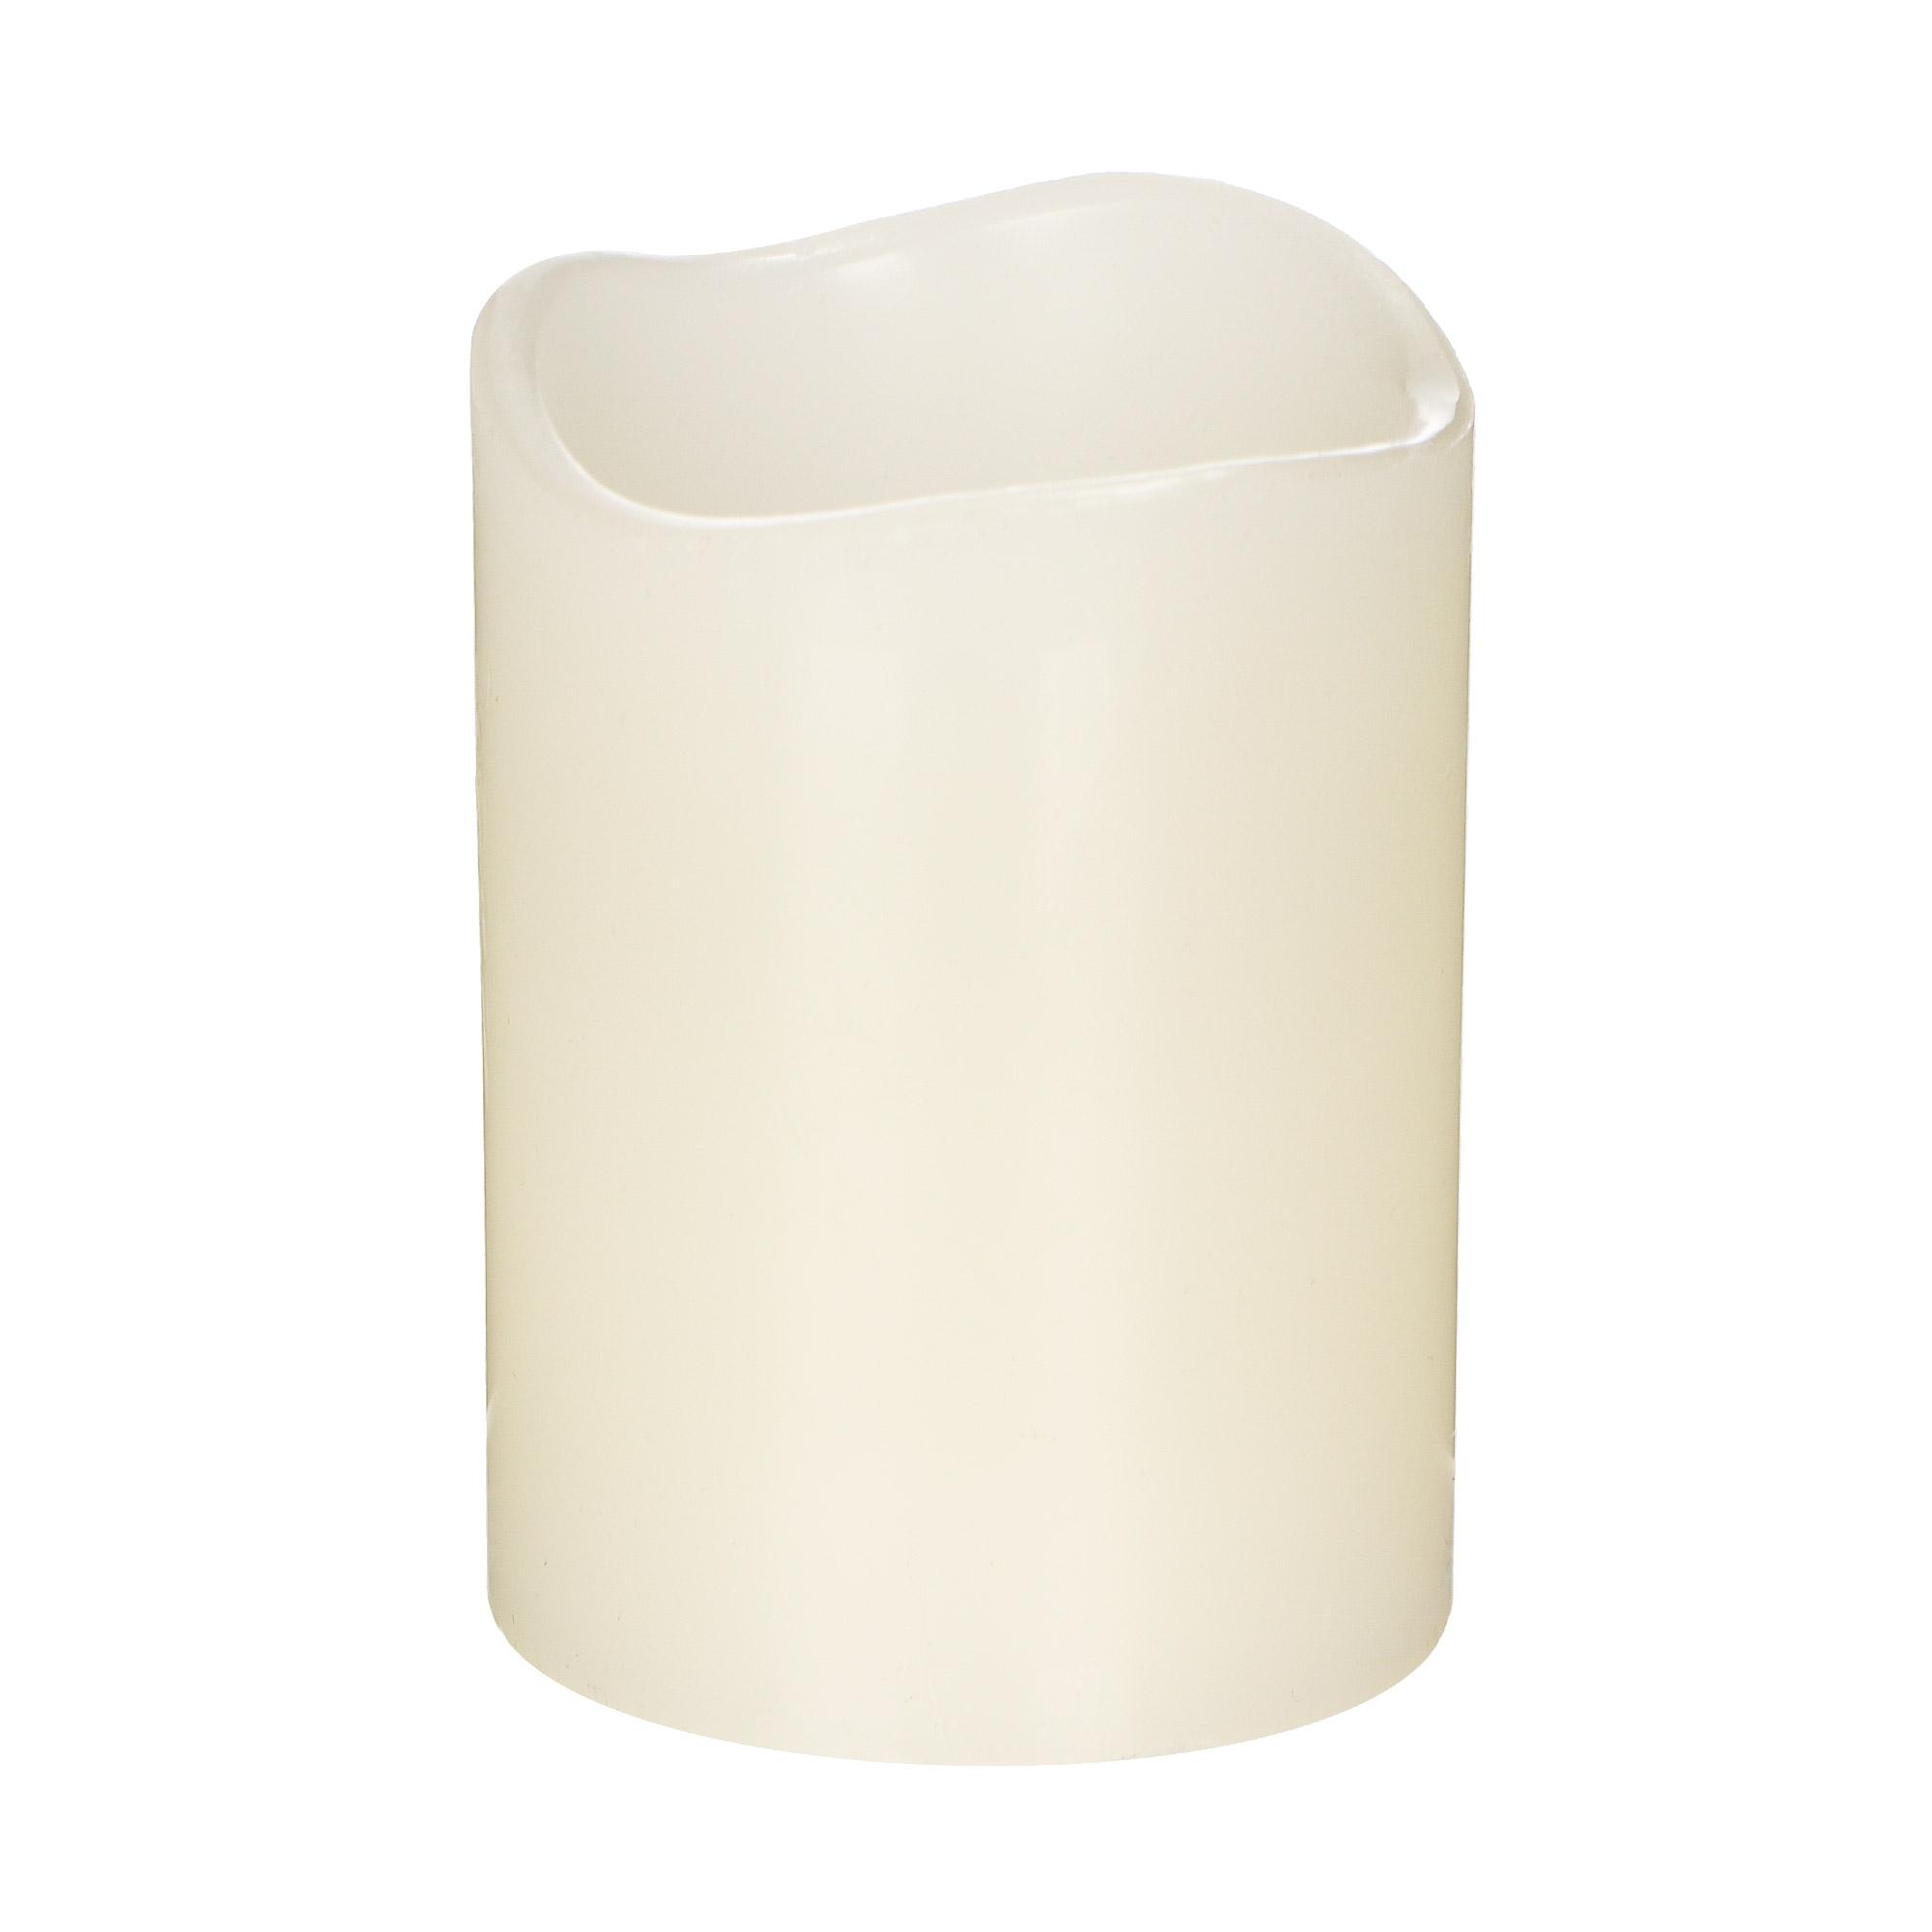 Свеча Sunford led 5x6.6 cm